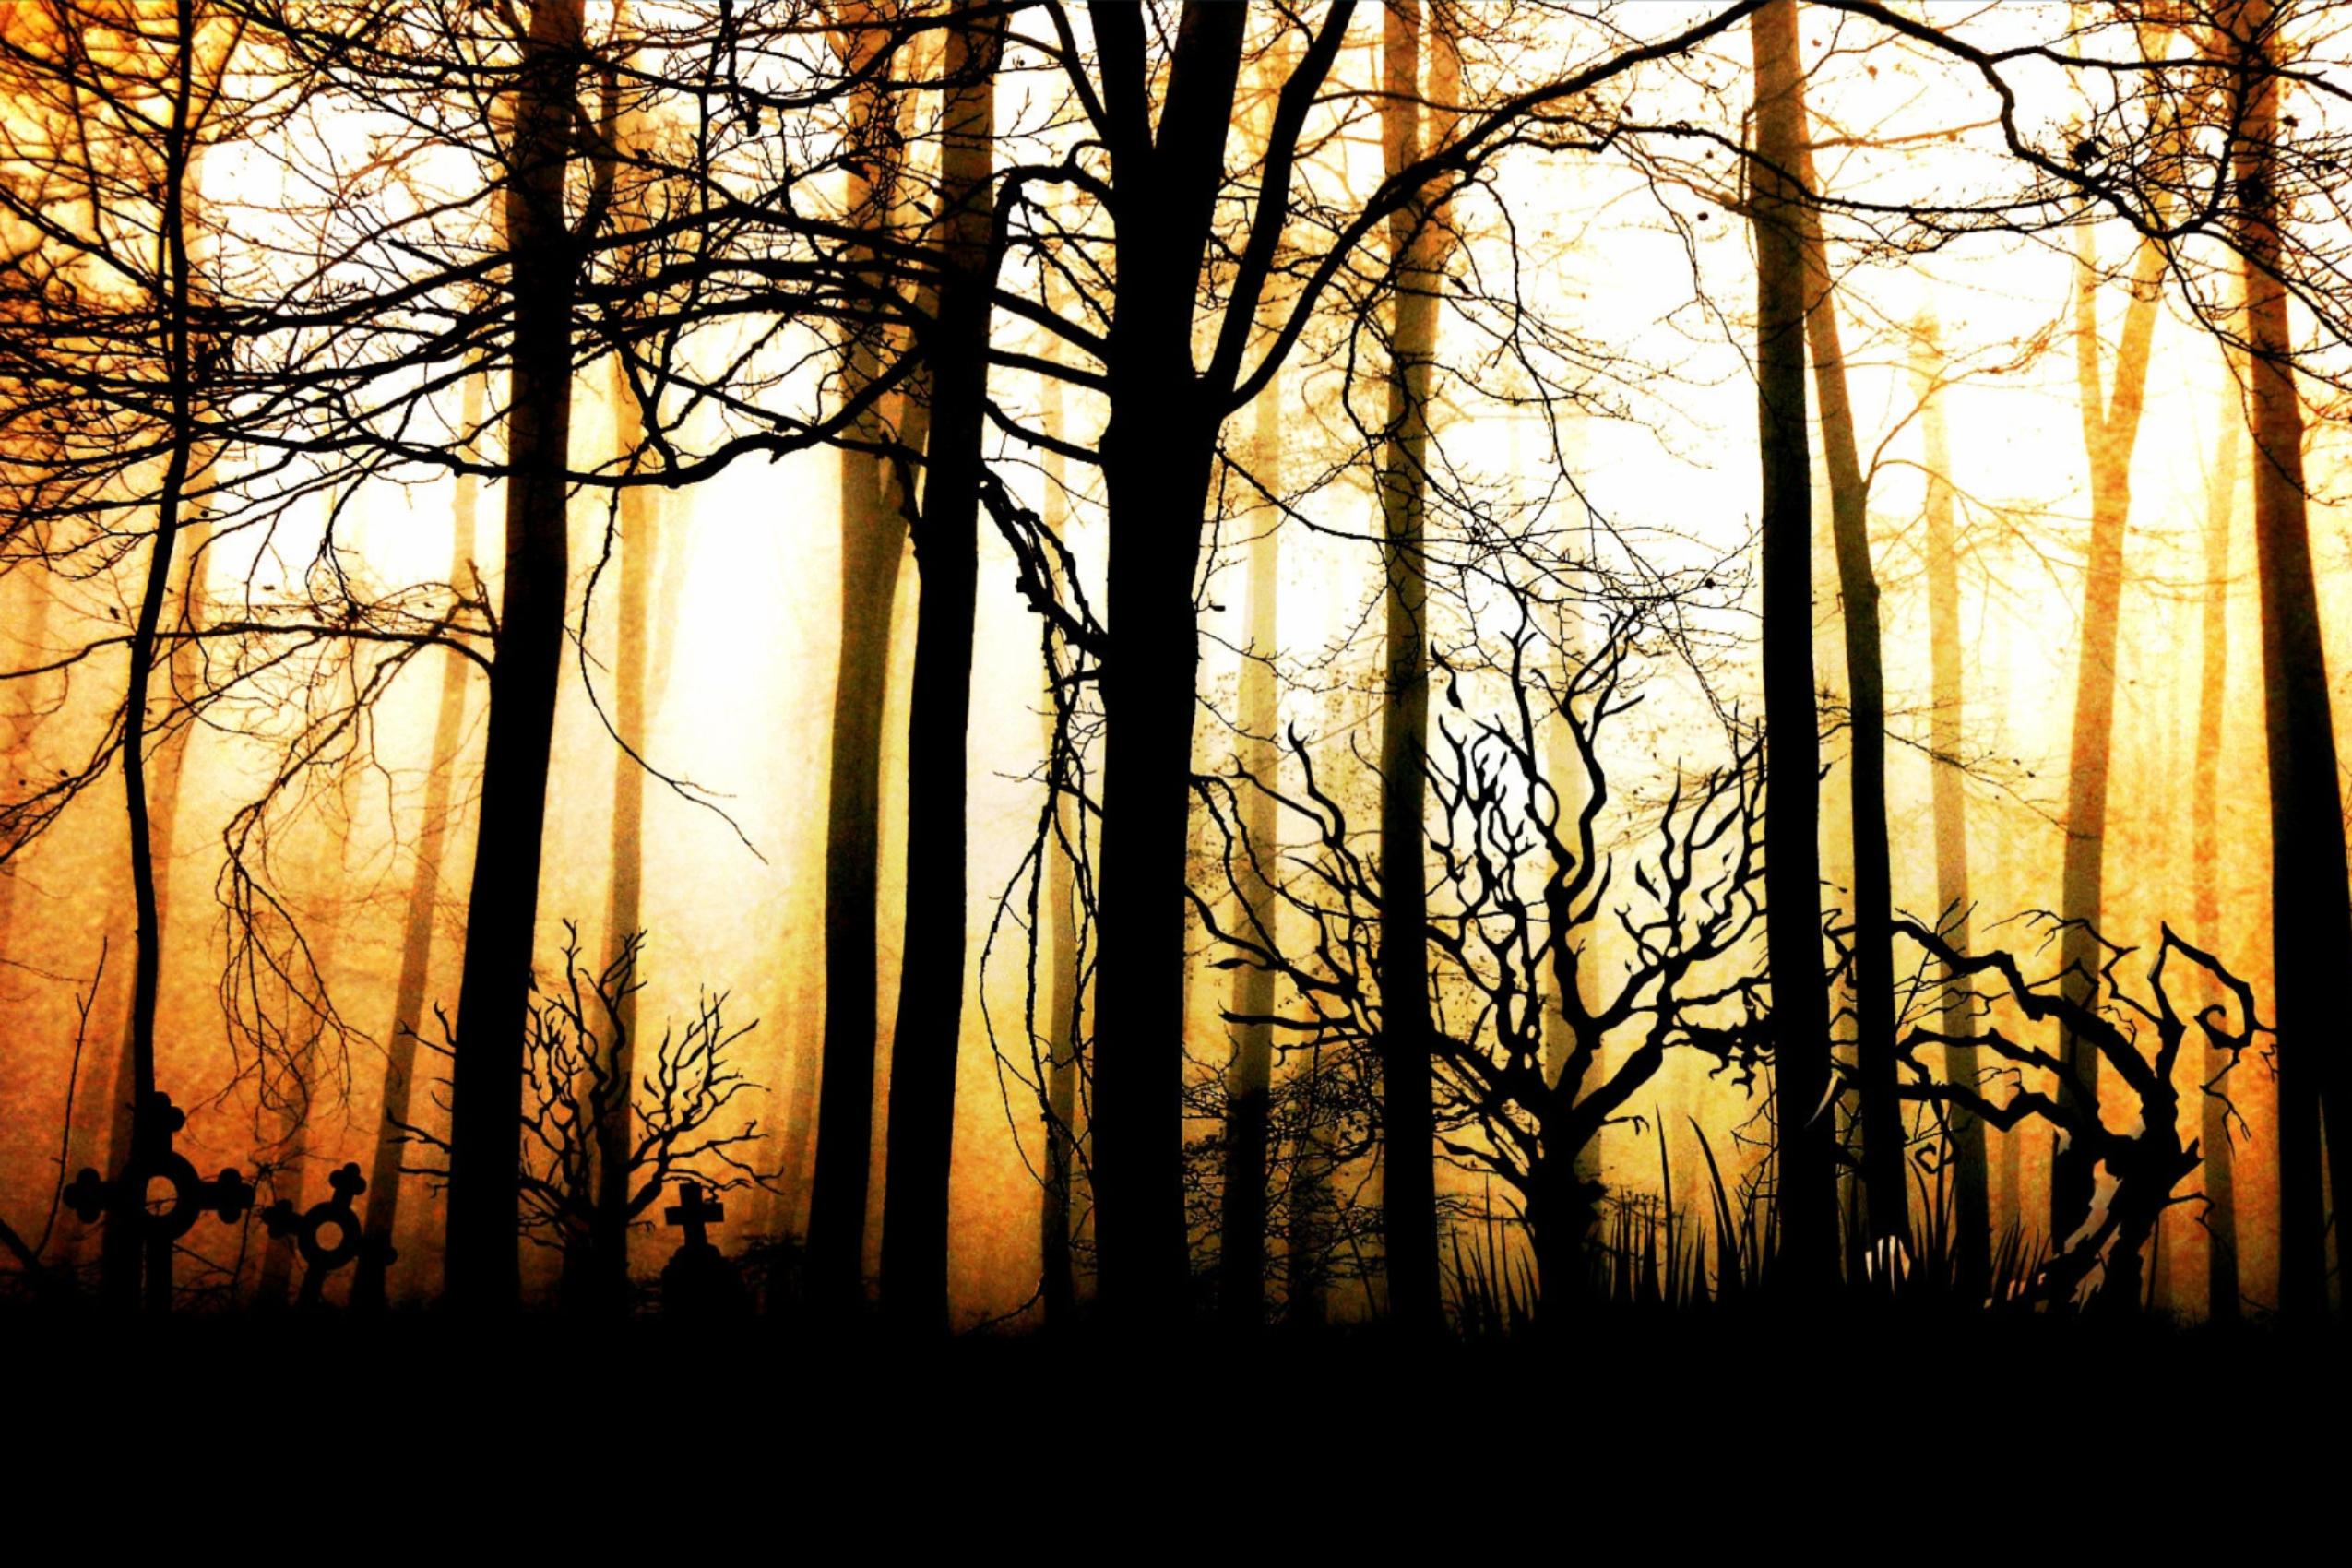 haunted houses in nashville | creepy woods